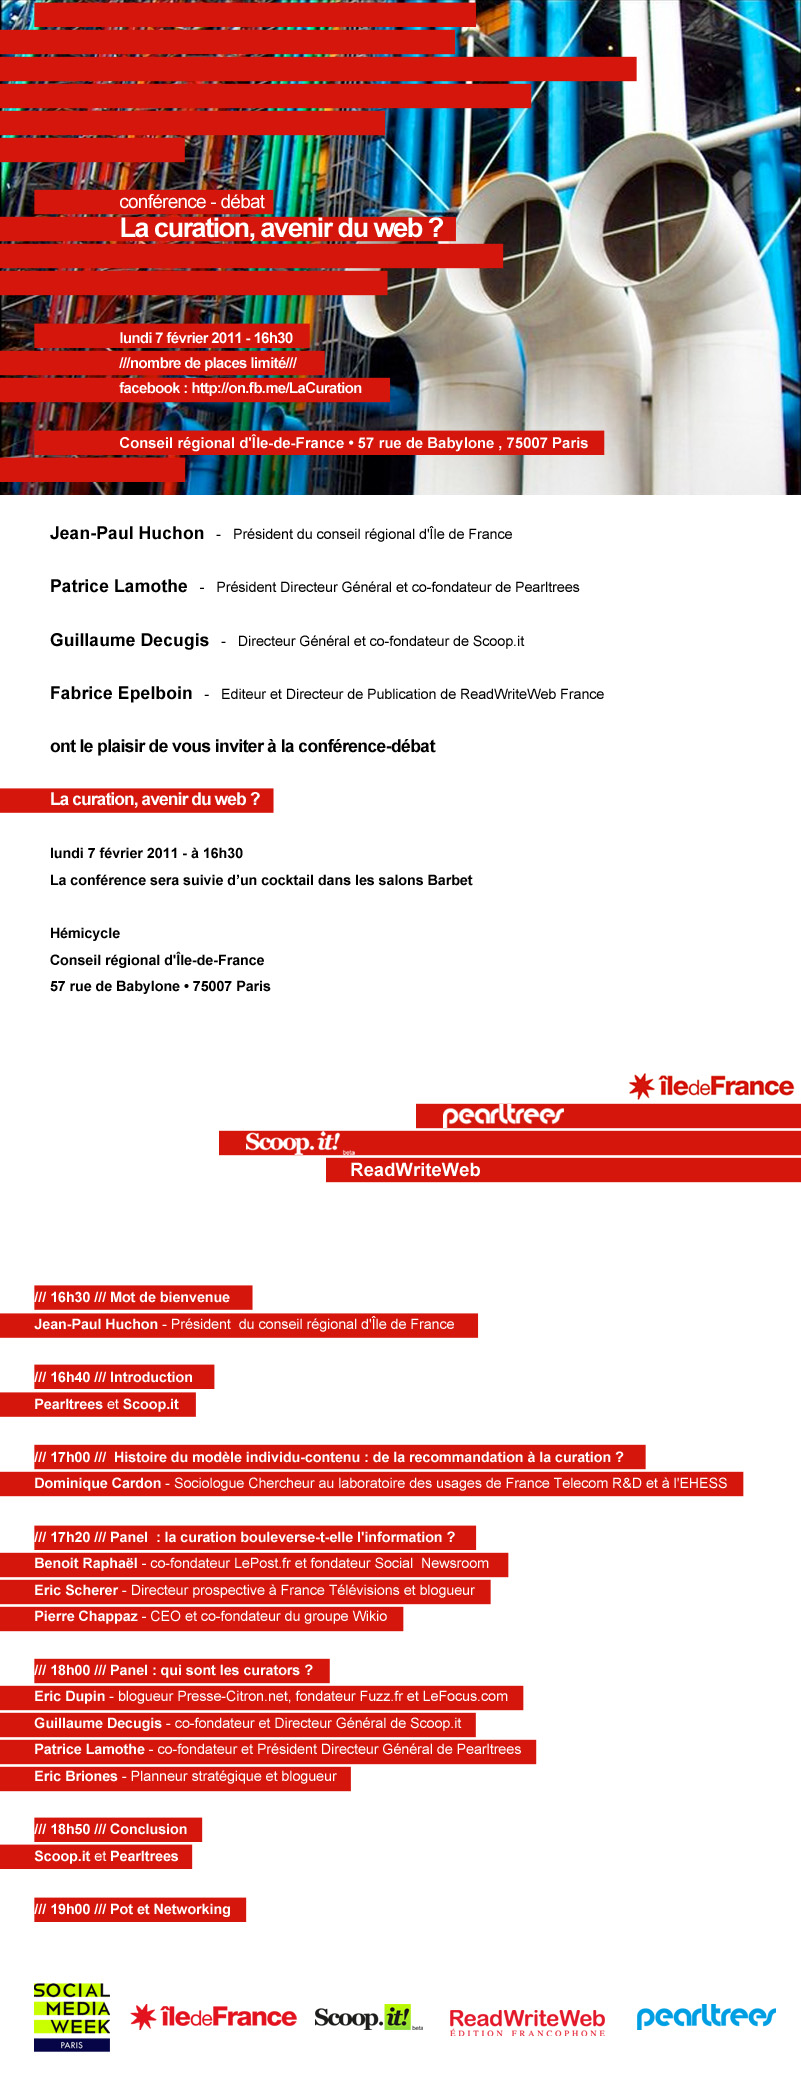 invitation_curation_avenir_web_event